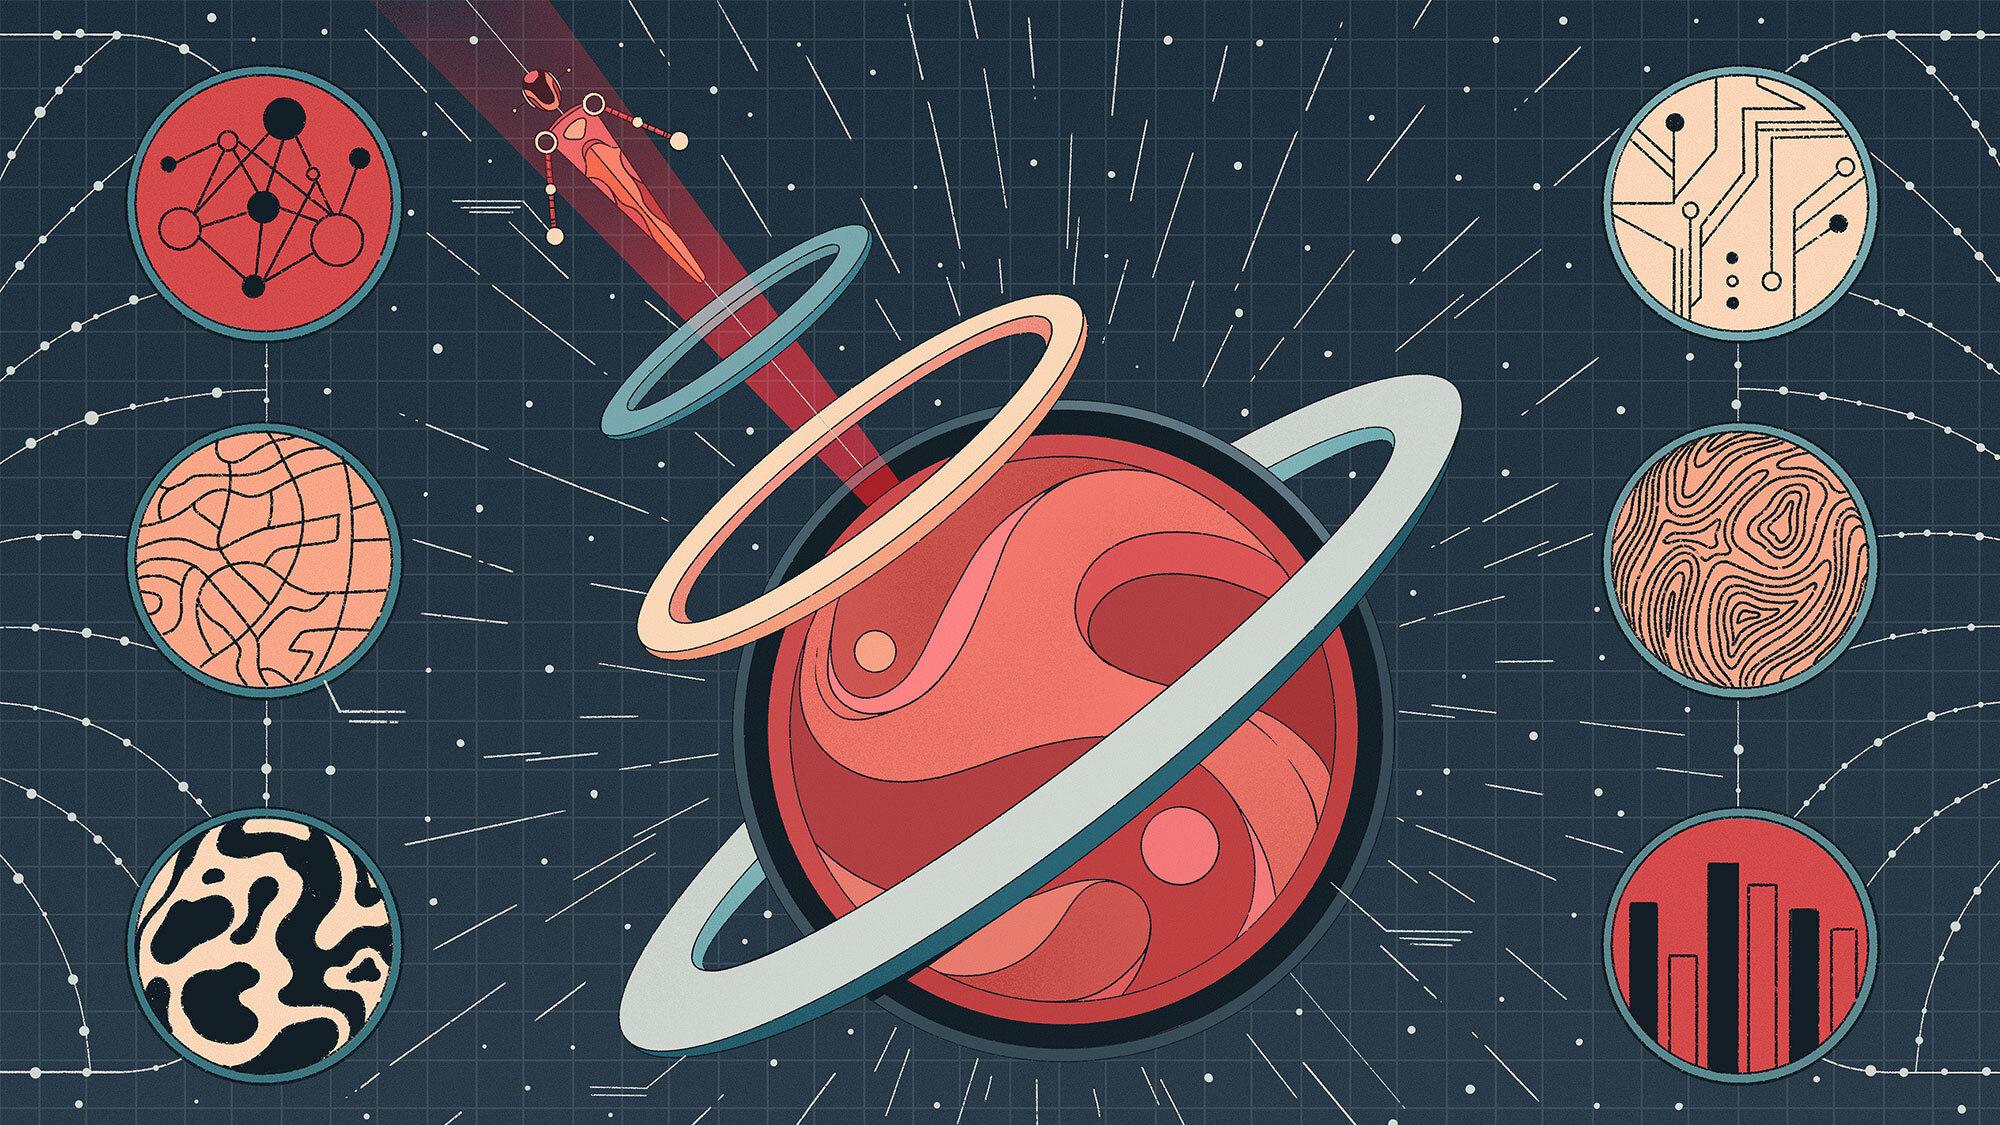 Illustration by Olivia Fields